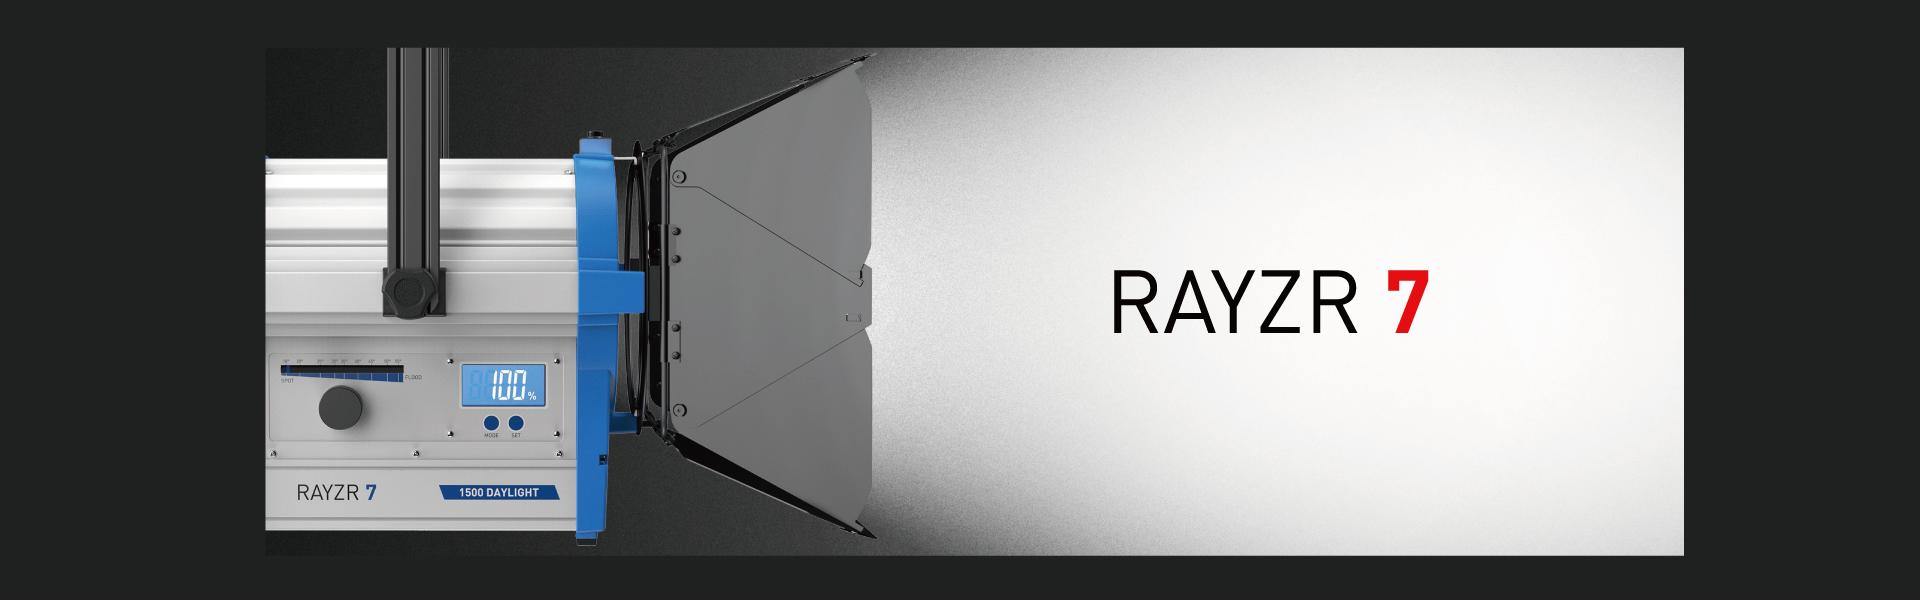 RAYZR